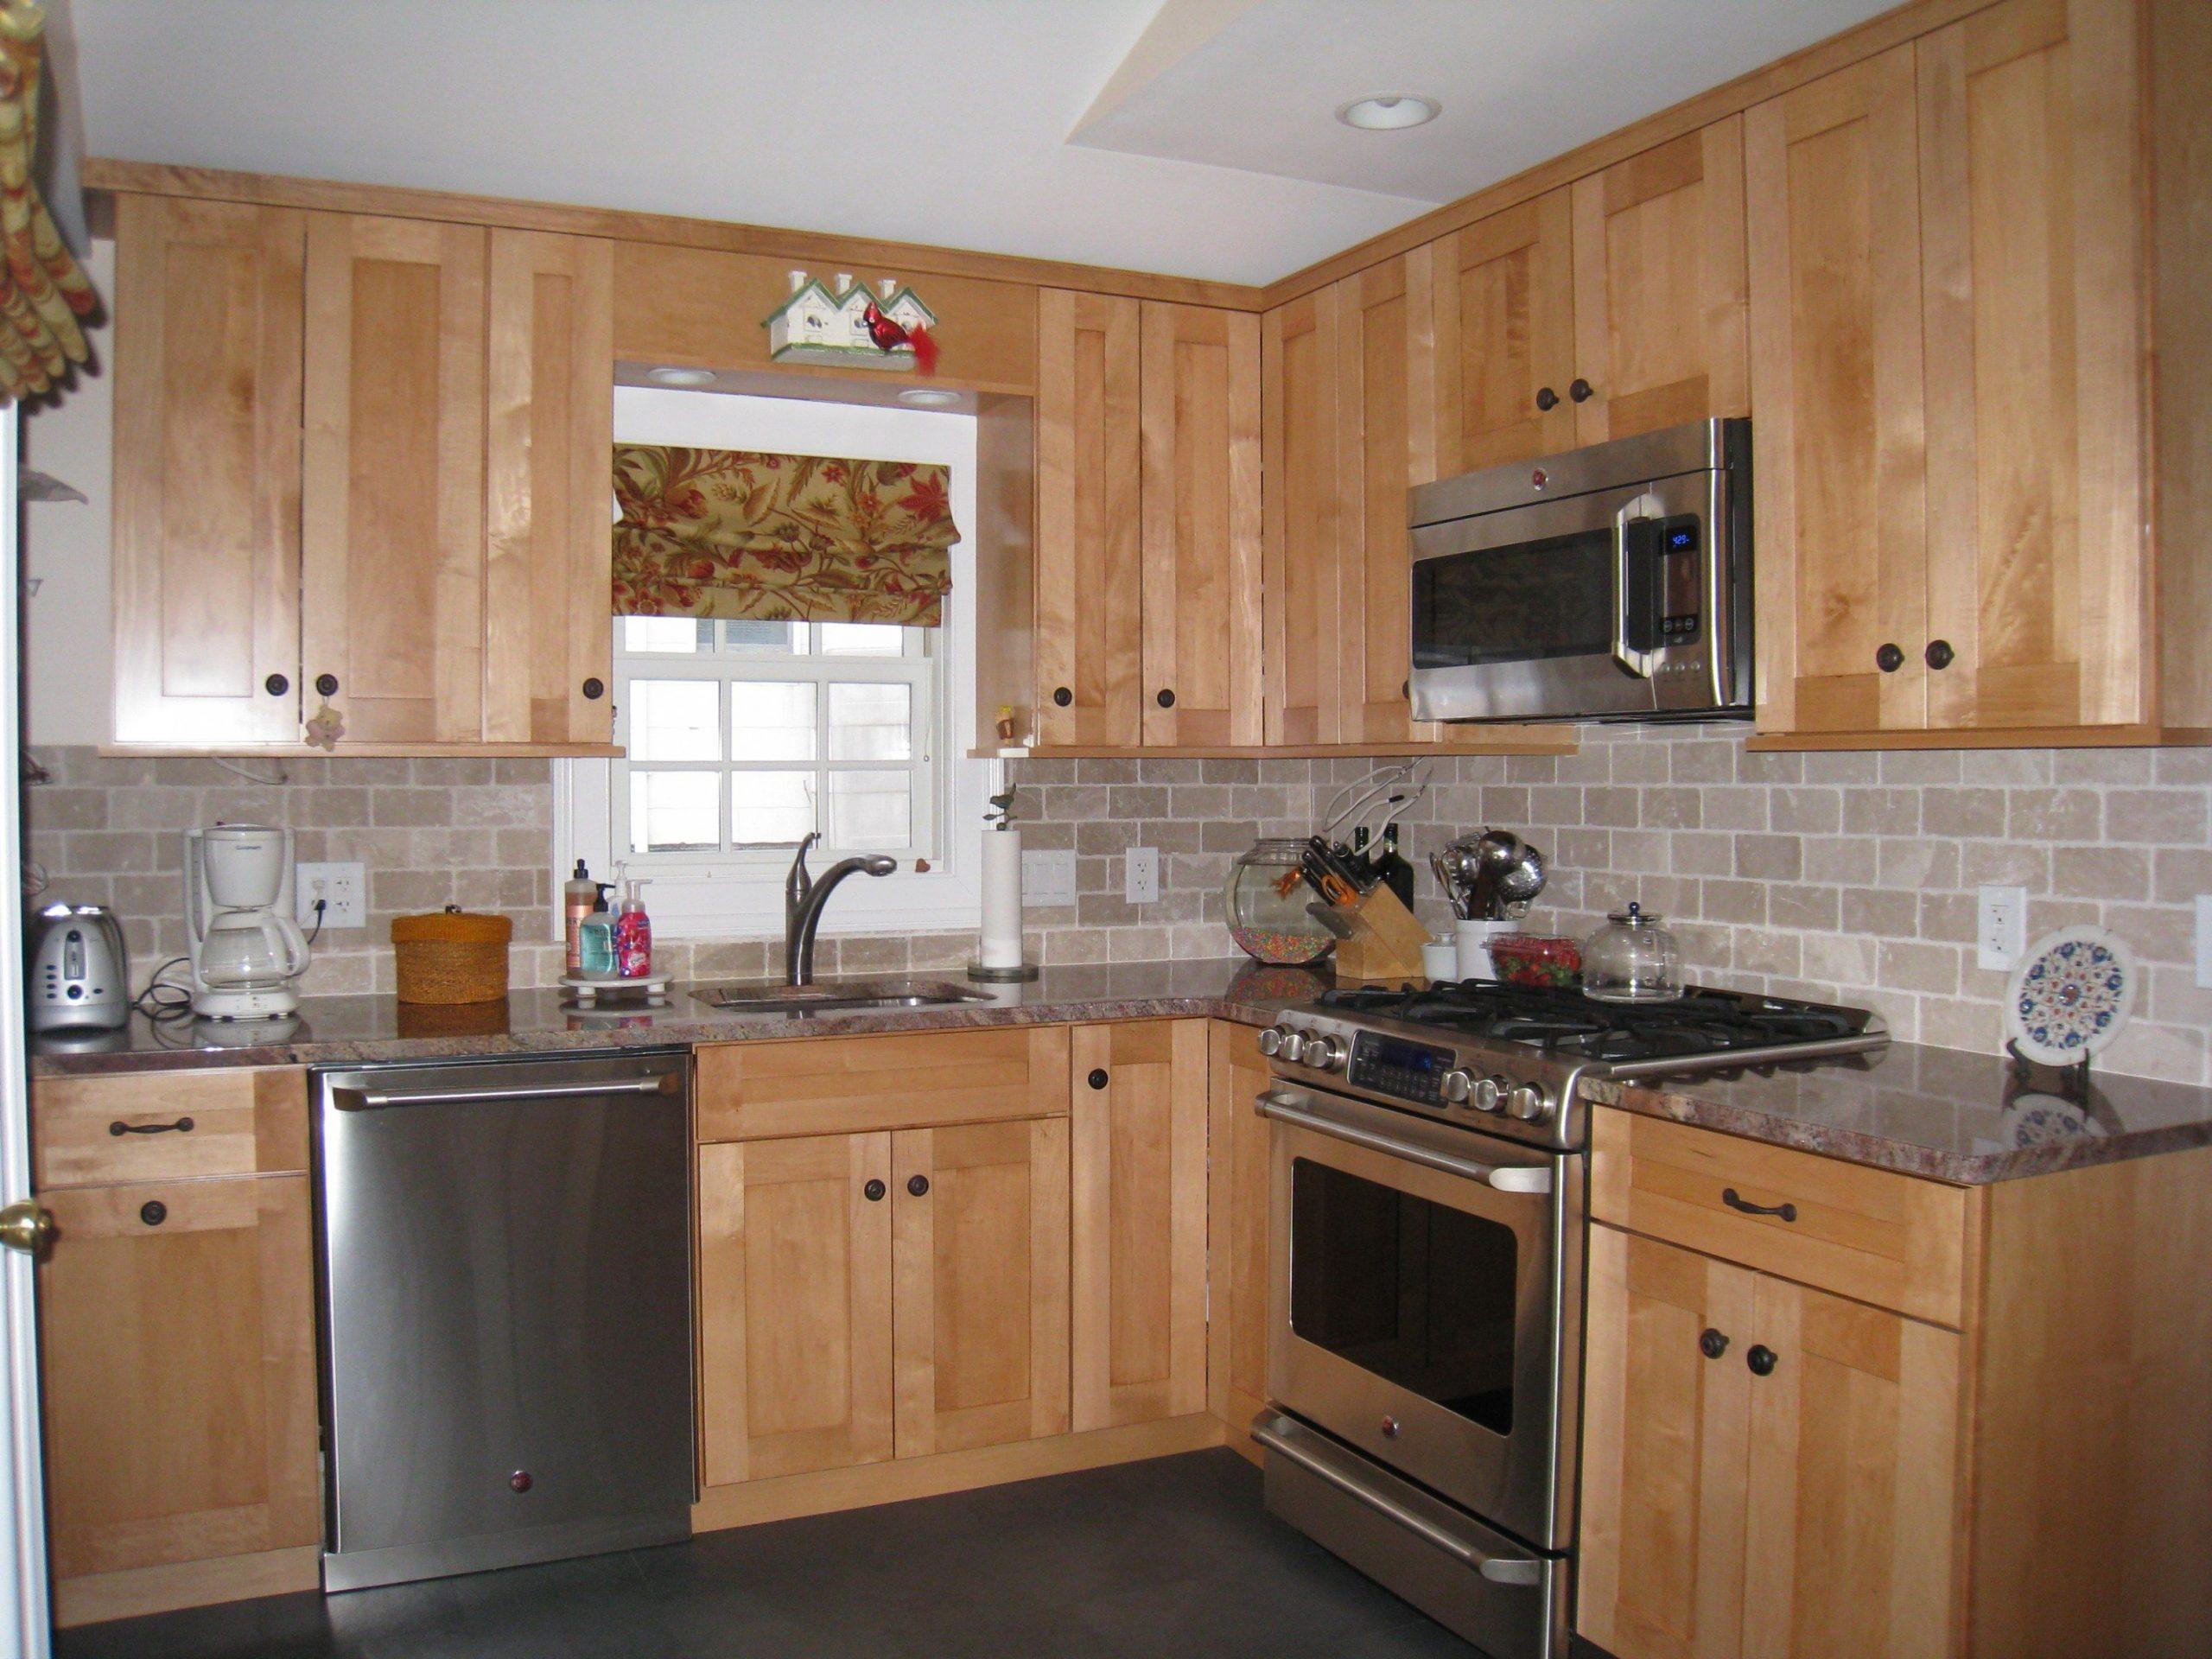 backsplash for kitchen with honey oak cabinets - Google Search  - Kitchen Backsplash With Light Wood Cabinets